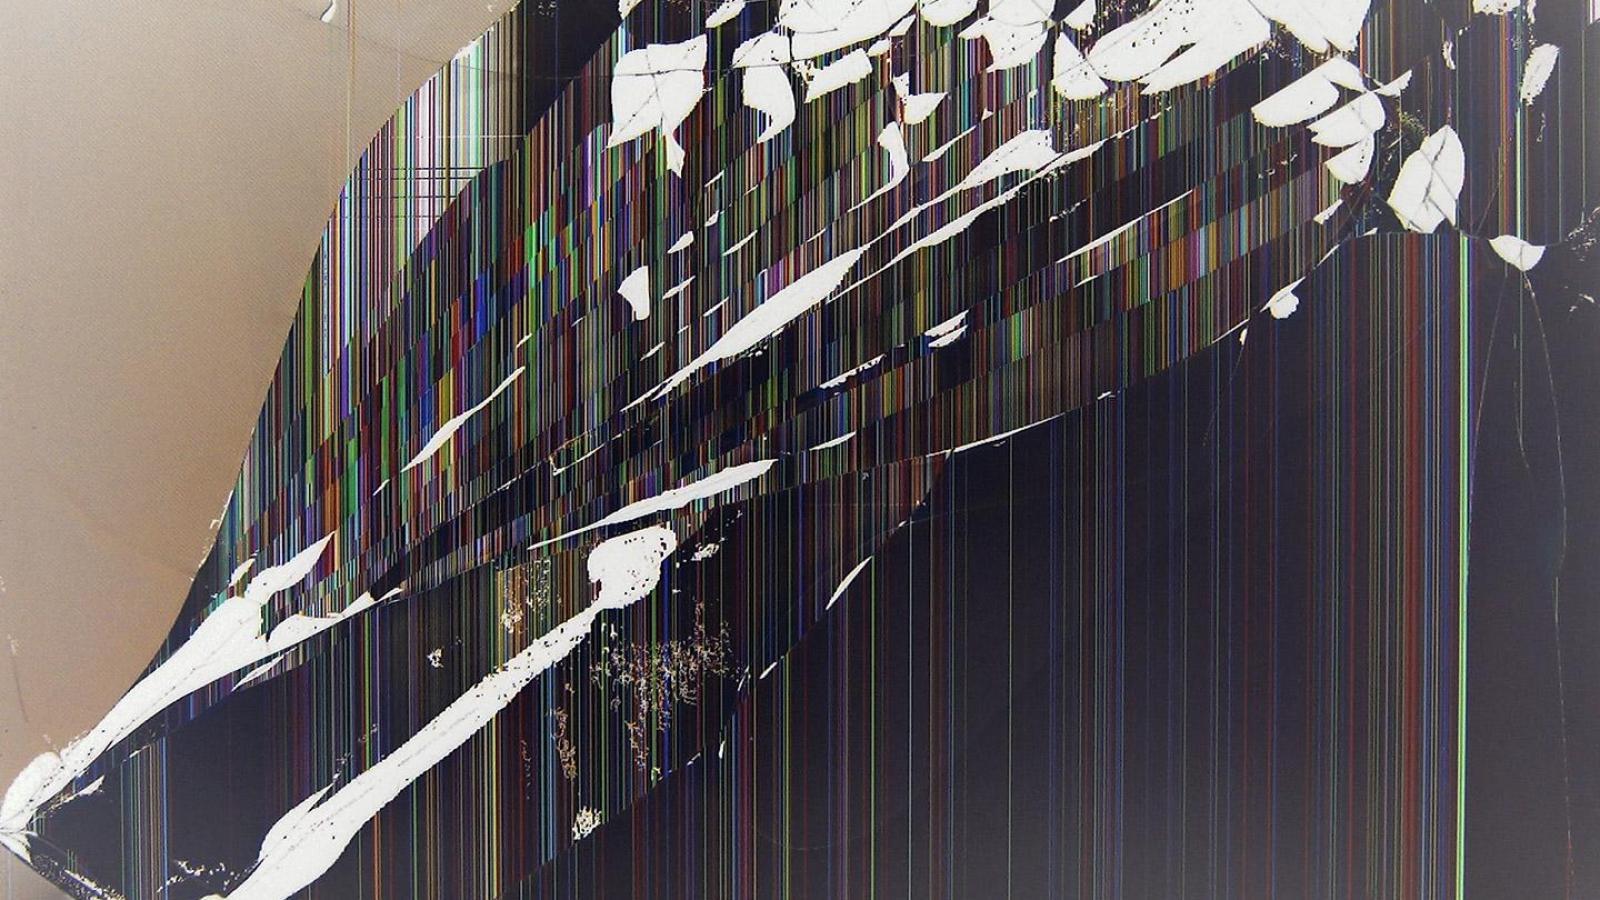 Broken screen wallpaper HQ WALLPAPER   178553 1600x900